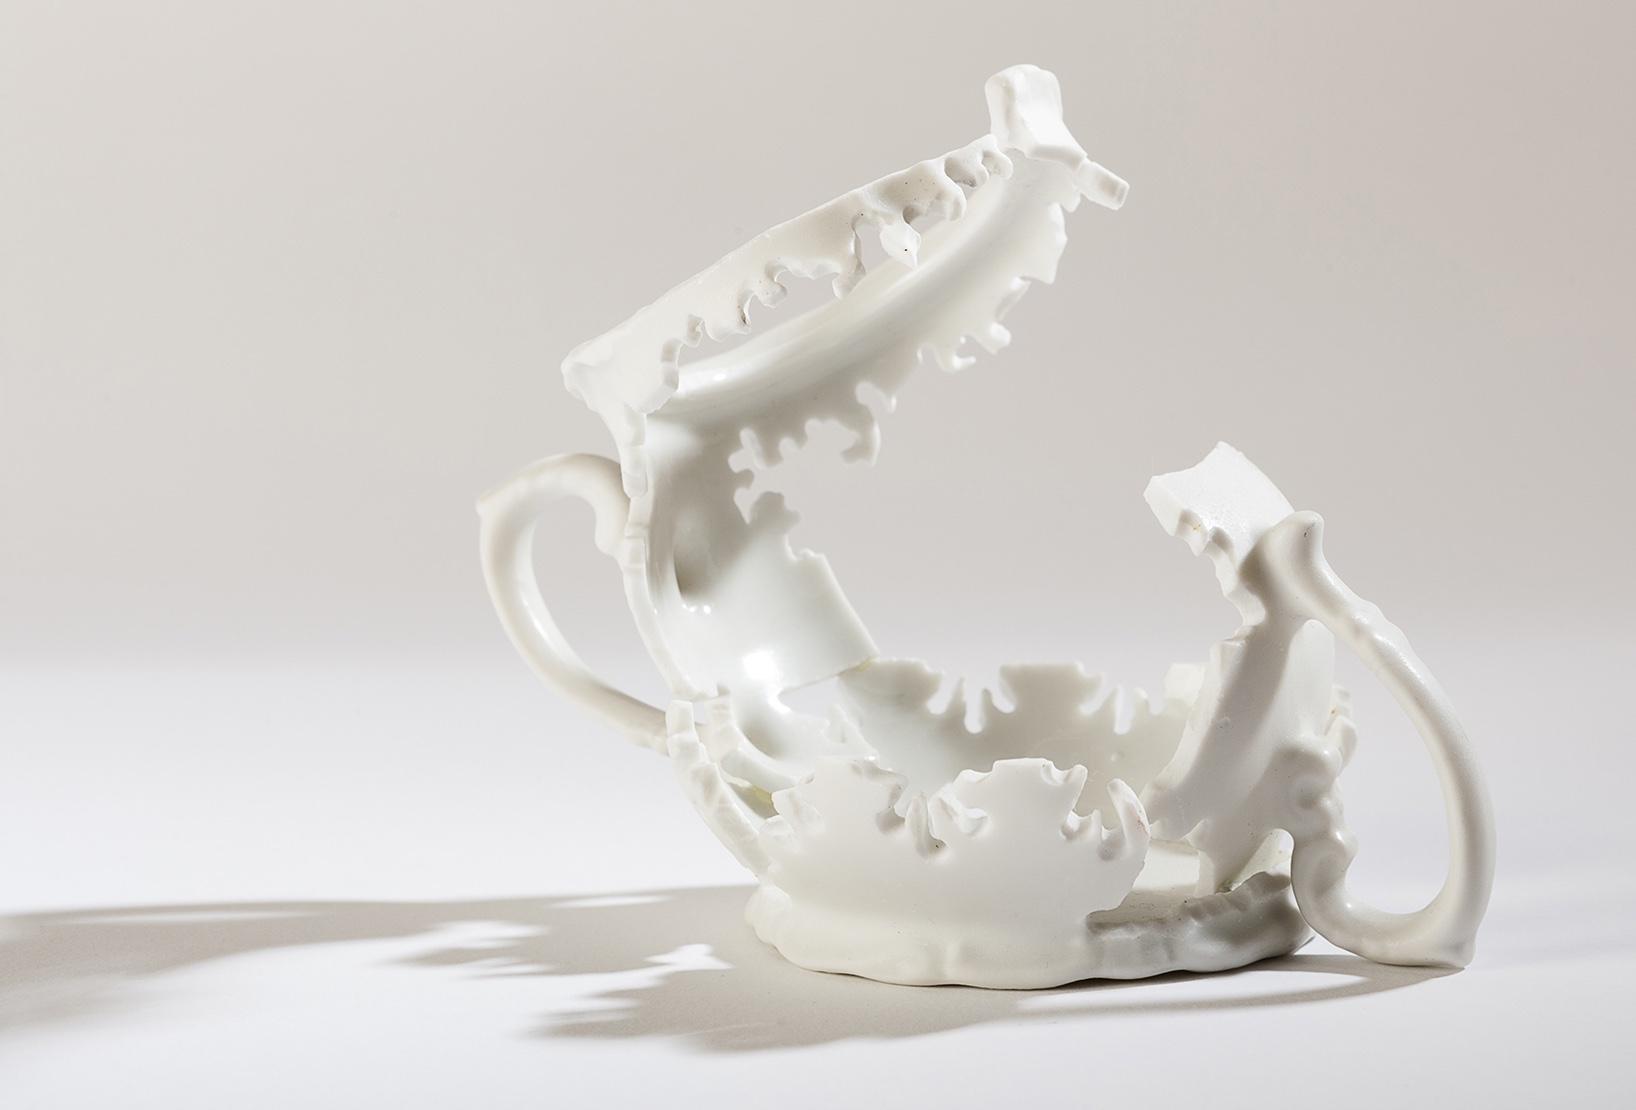 "Sugar Elizabeth Alexander hand cut found porcelain 4"" x 5"" x 3"" 2013 photo by Darren Stahlman"